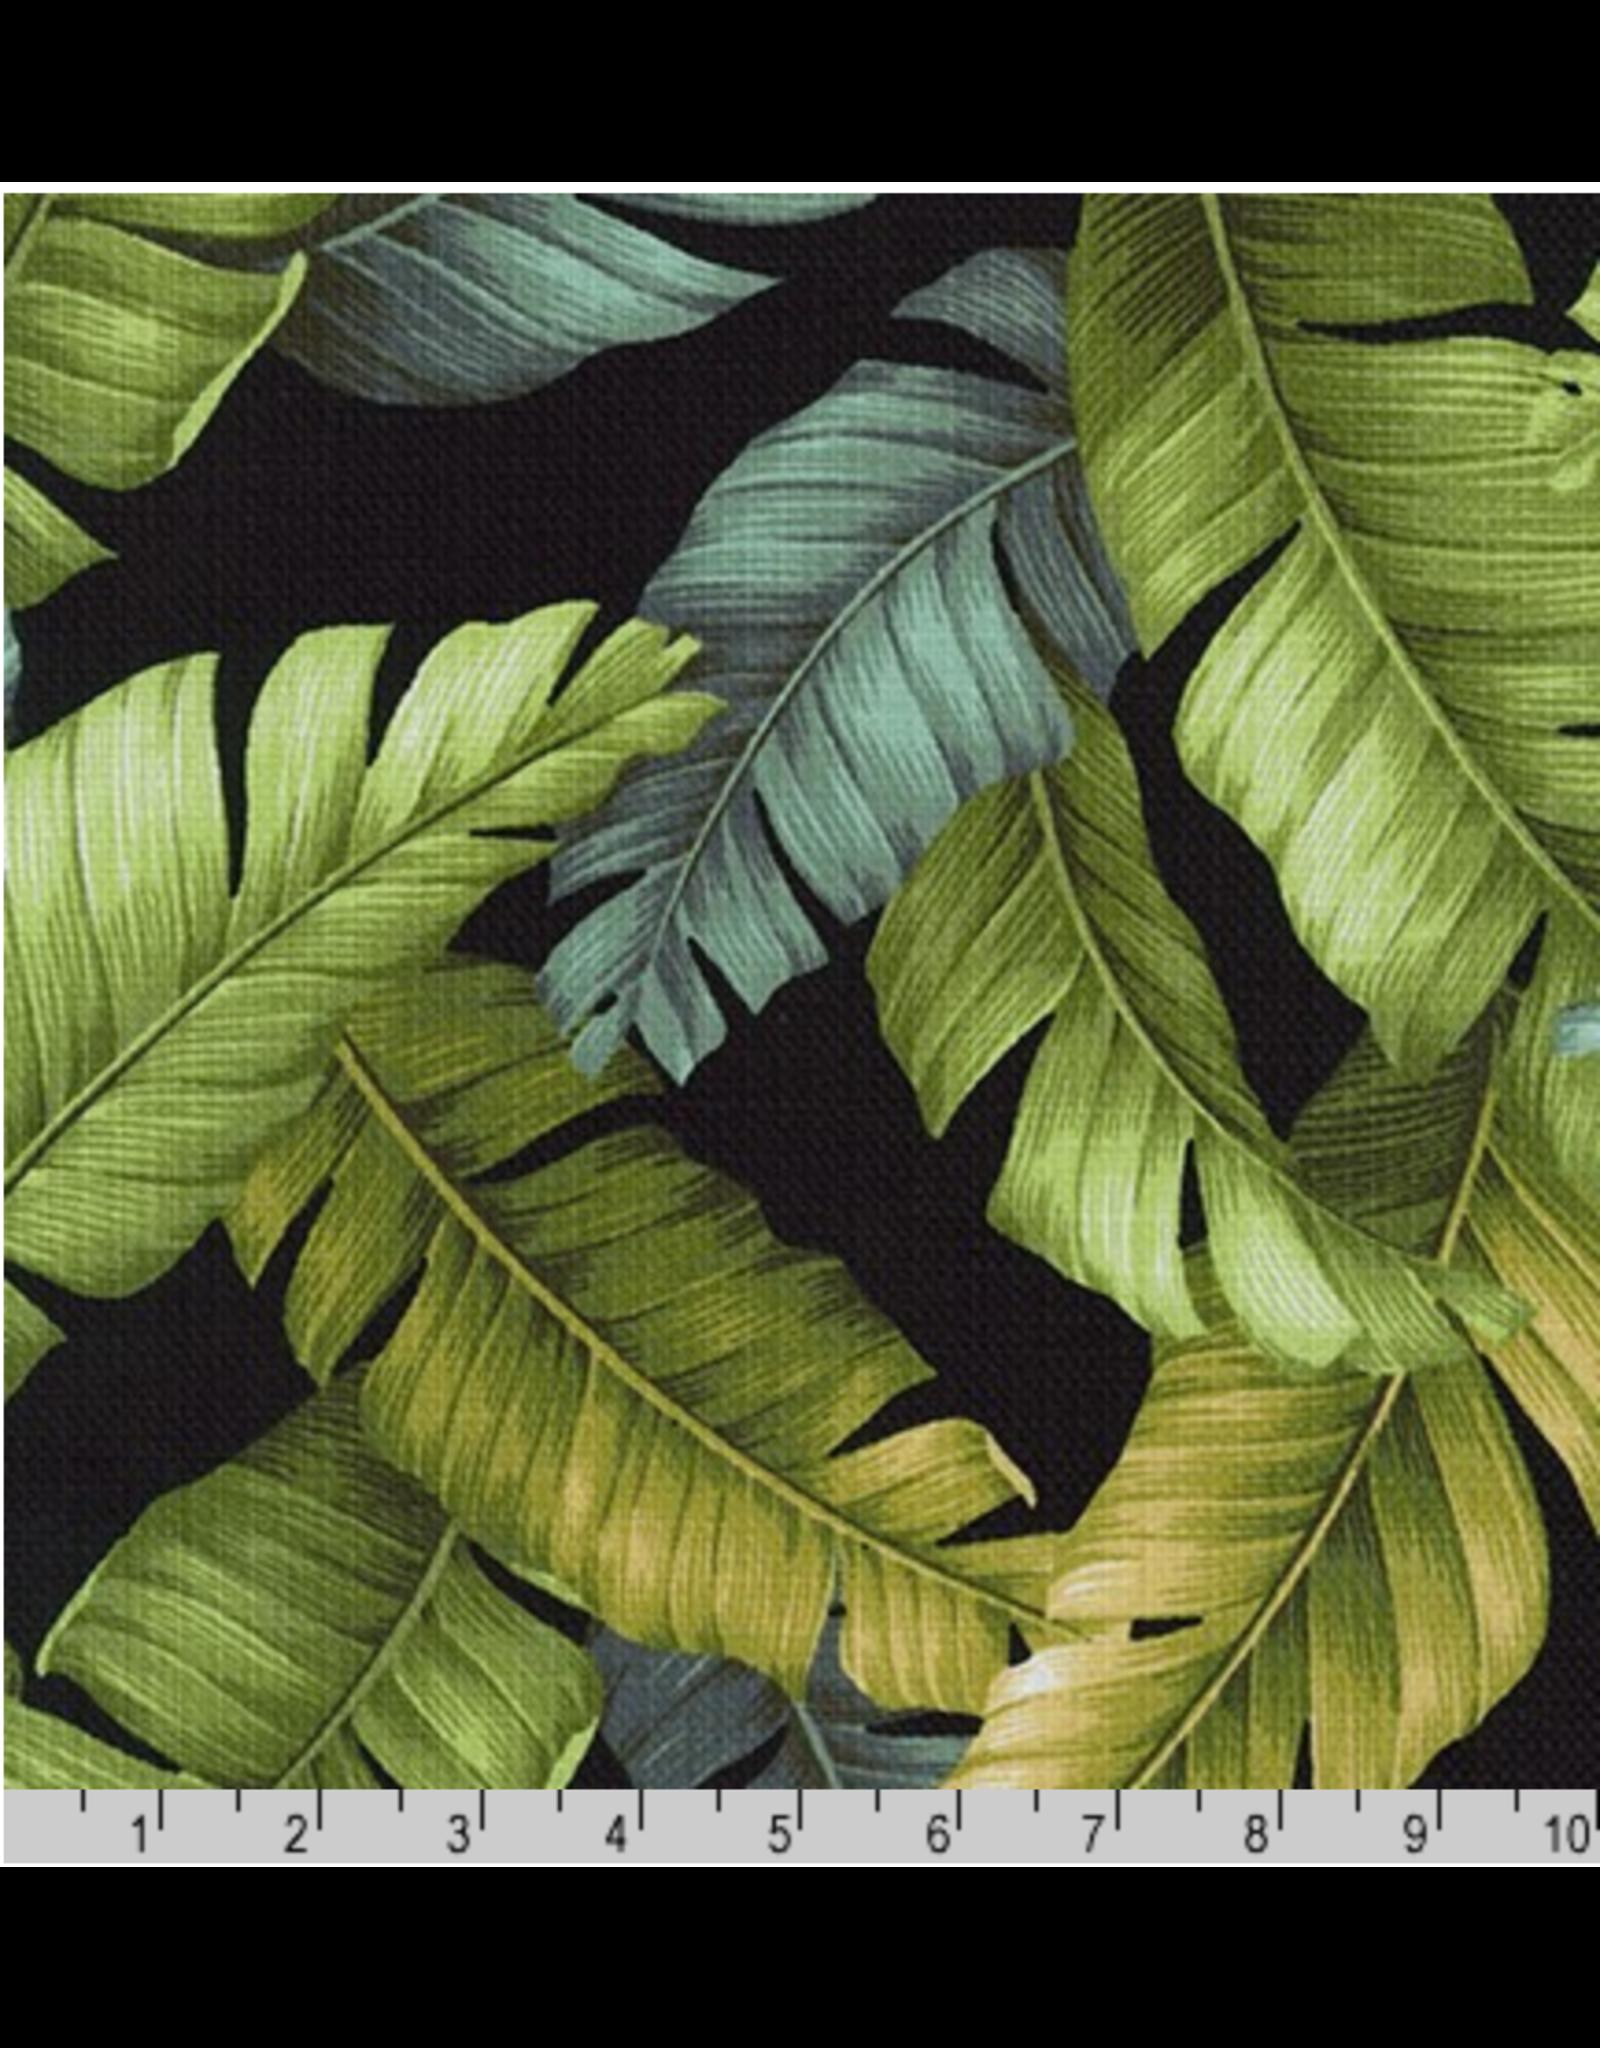 Sevenberry Barkcloth, Island Paradise, Palm Leaves in Black, Fabric Half-Yards SB-4145D2-5